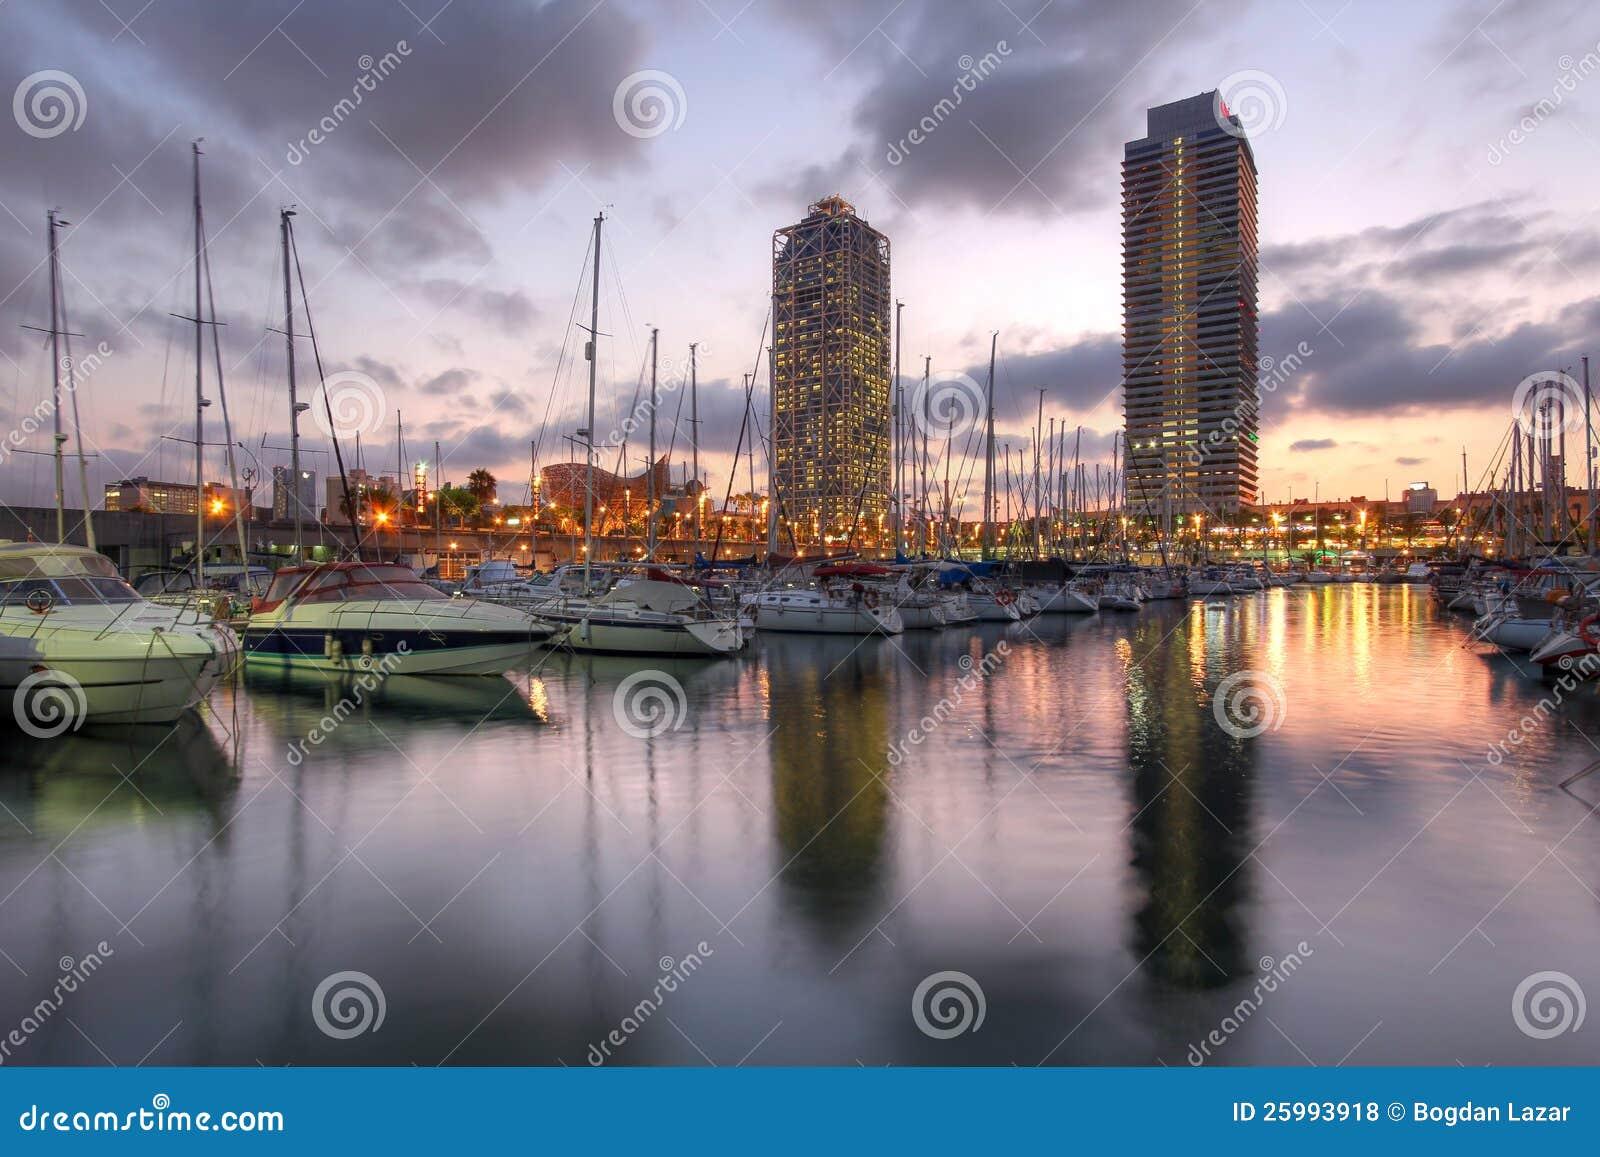 端口Olimpic,巴塞罗那,西班牙